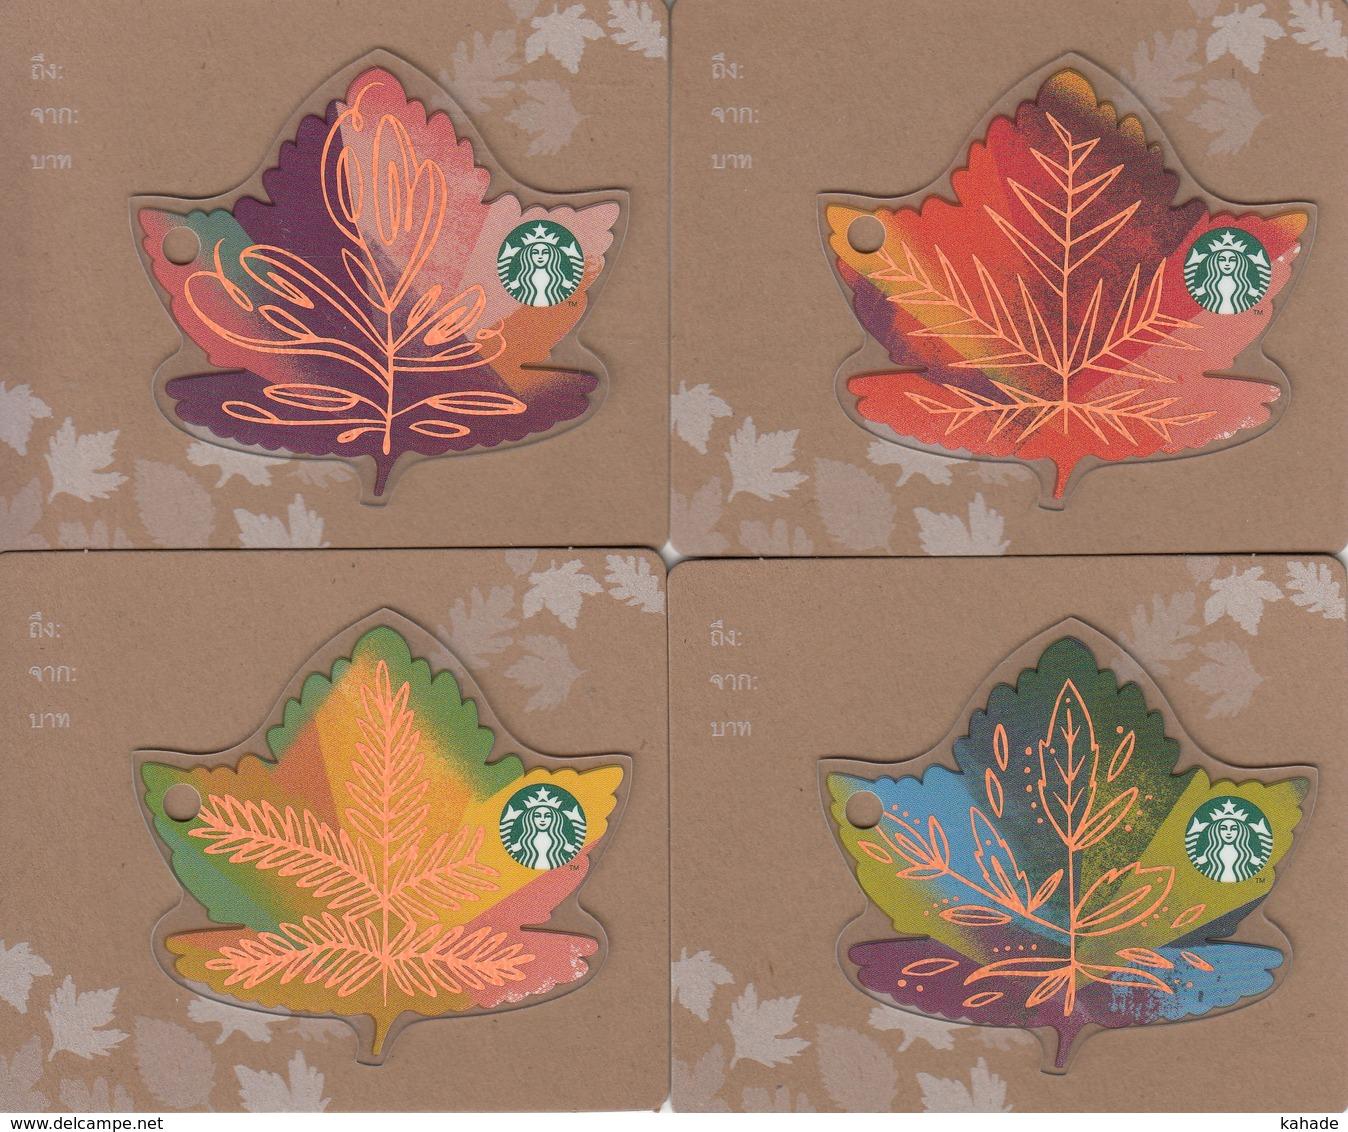 Set 4 X Thailand Starbucks Card   Leaves - 2015-6141 - Gift Cards